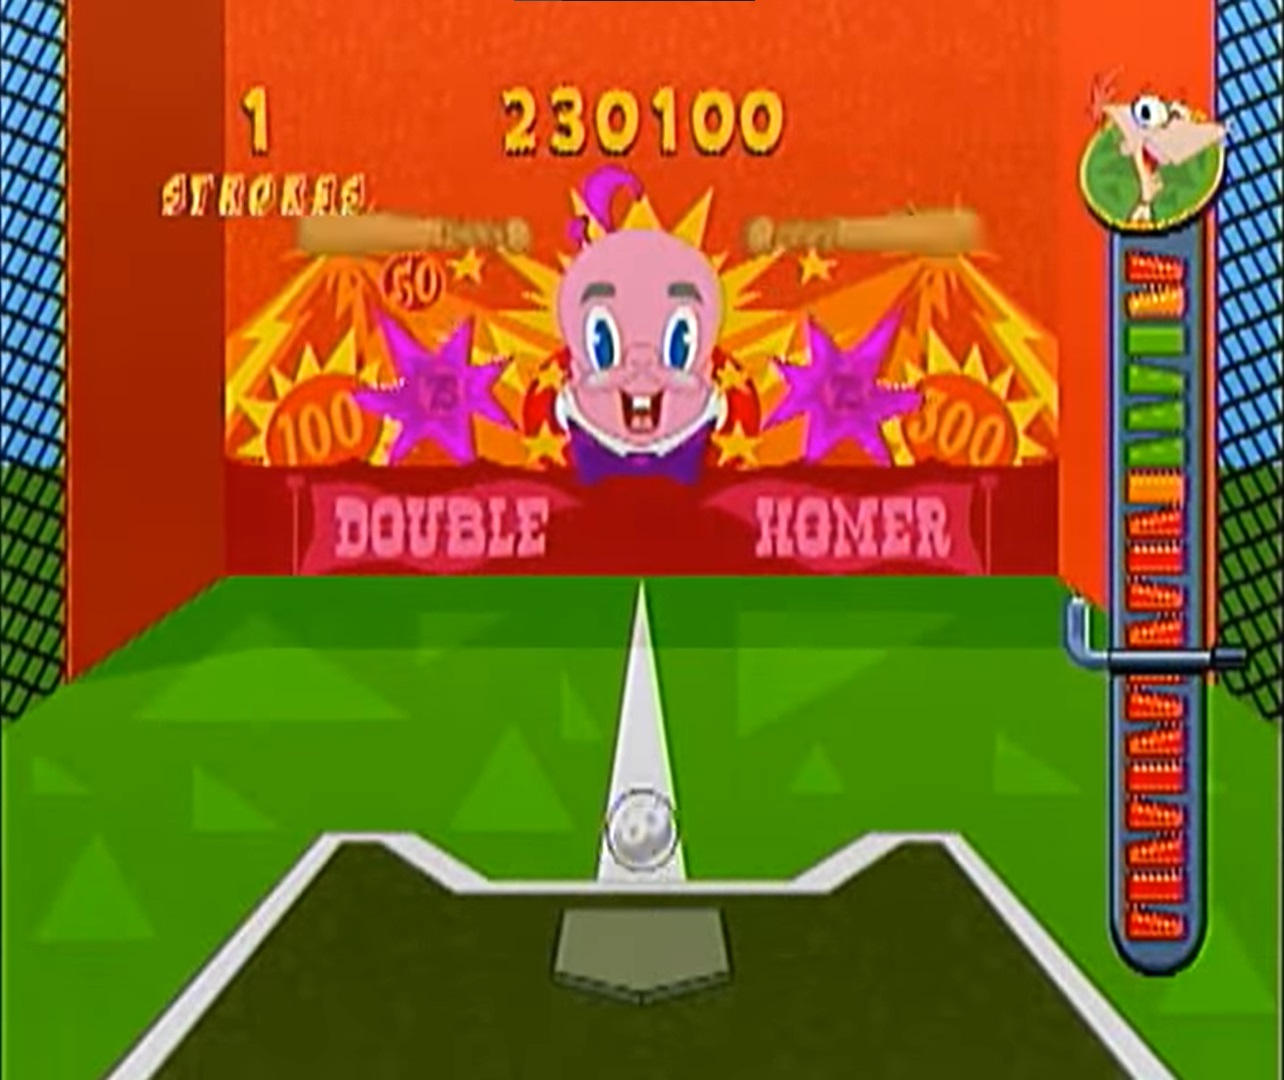 File:Best Game Ever! - golfing screenshot 6.jpg